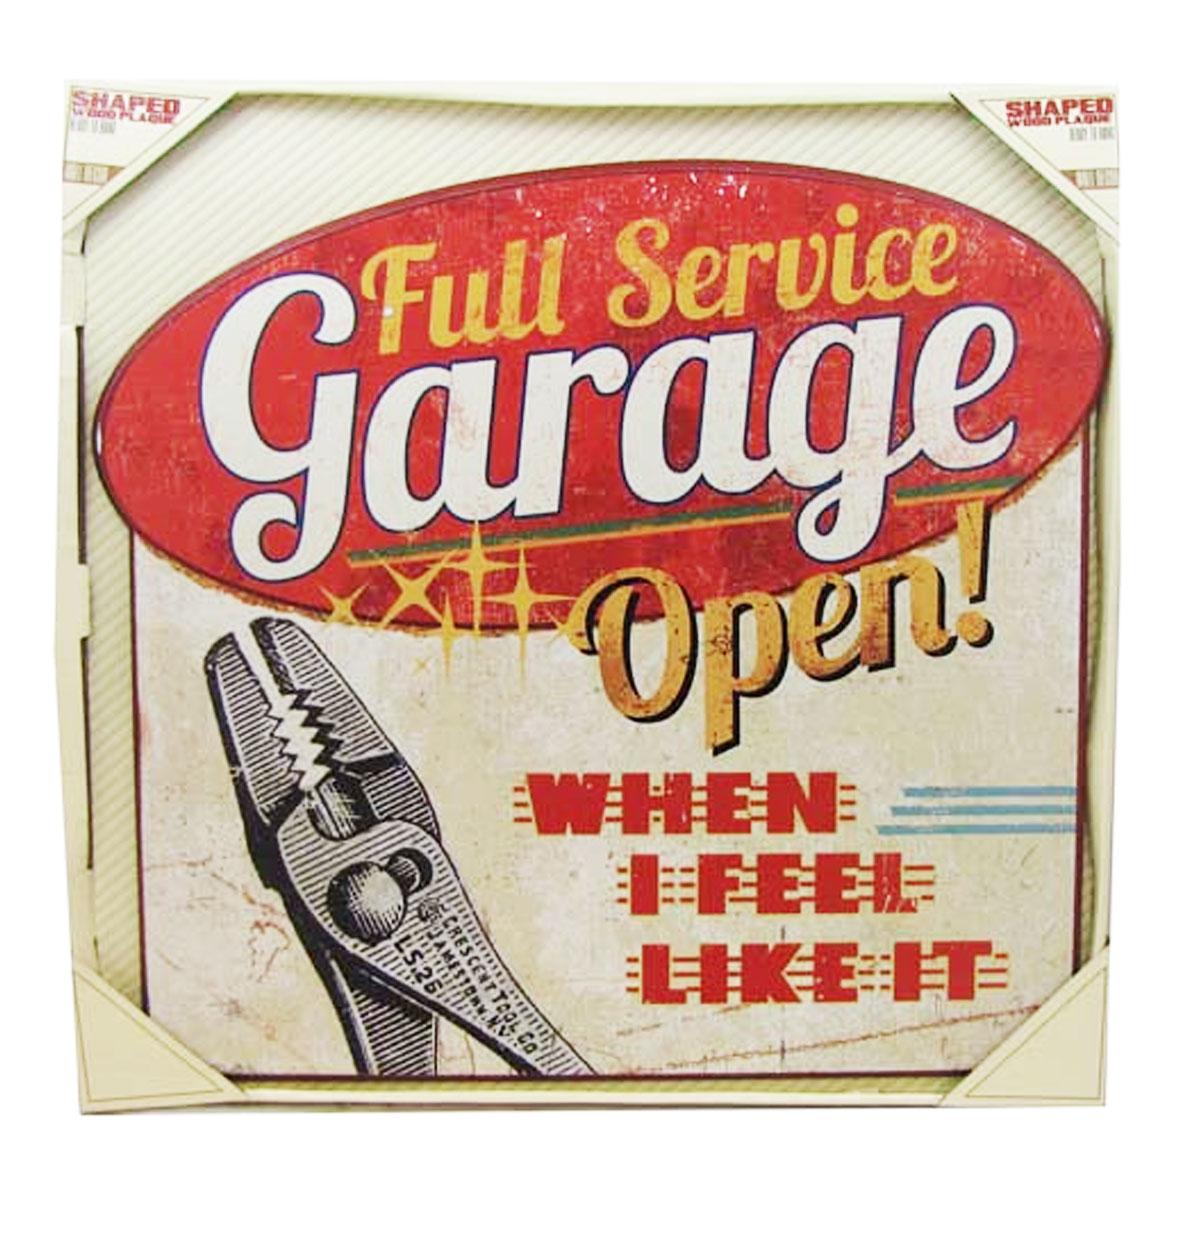 Full Service Garage Open! Houten Bord